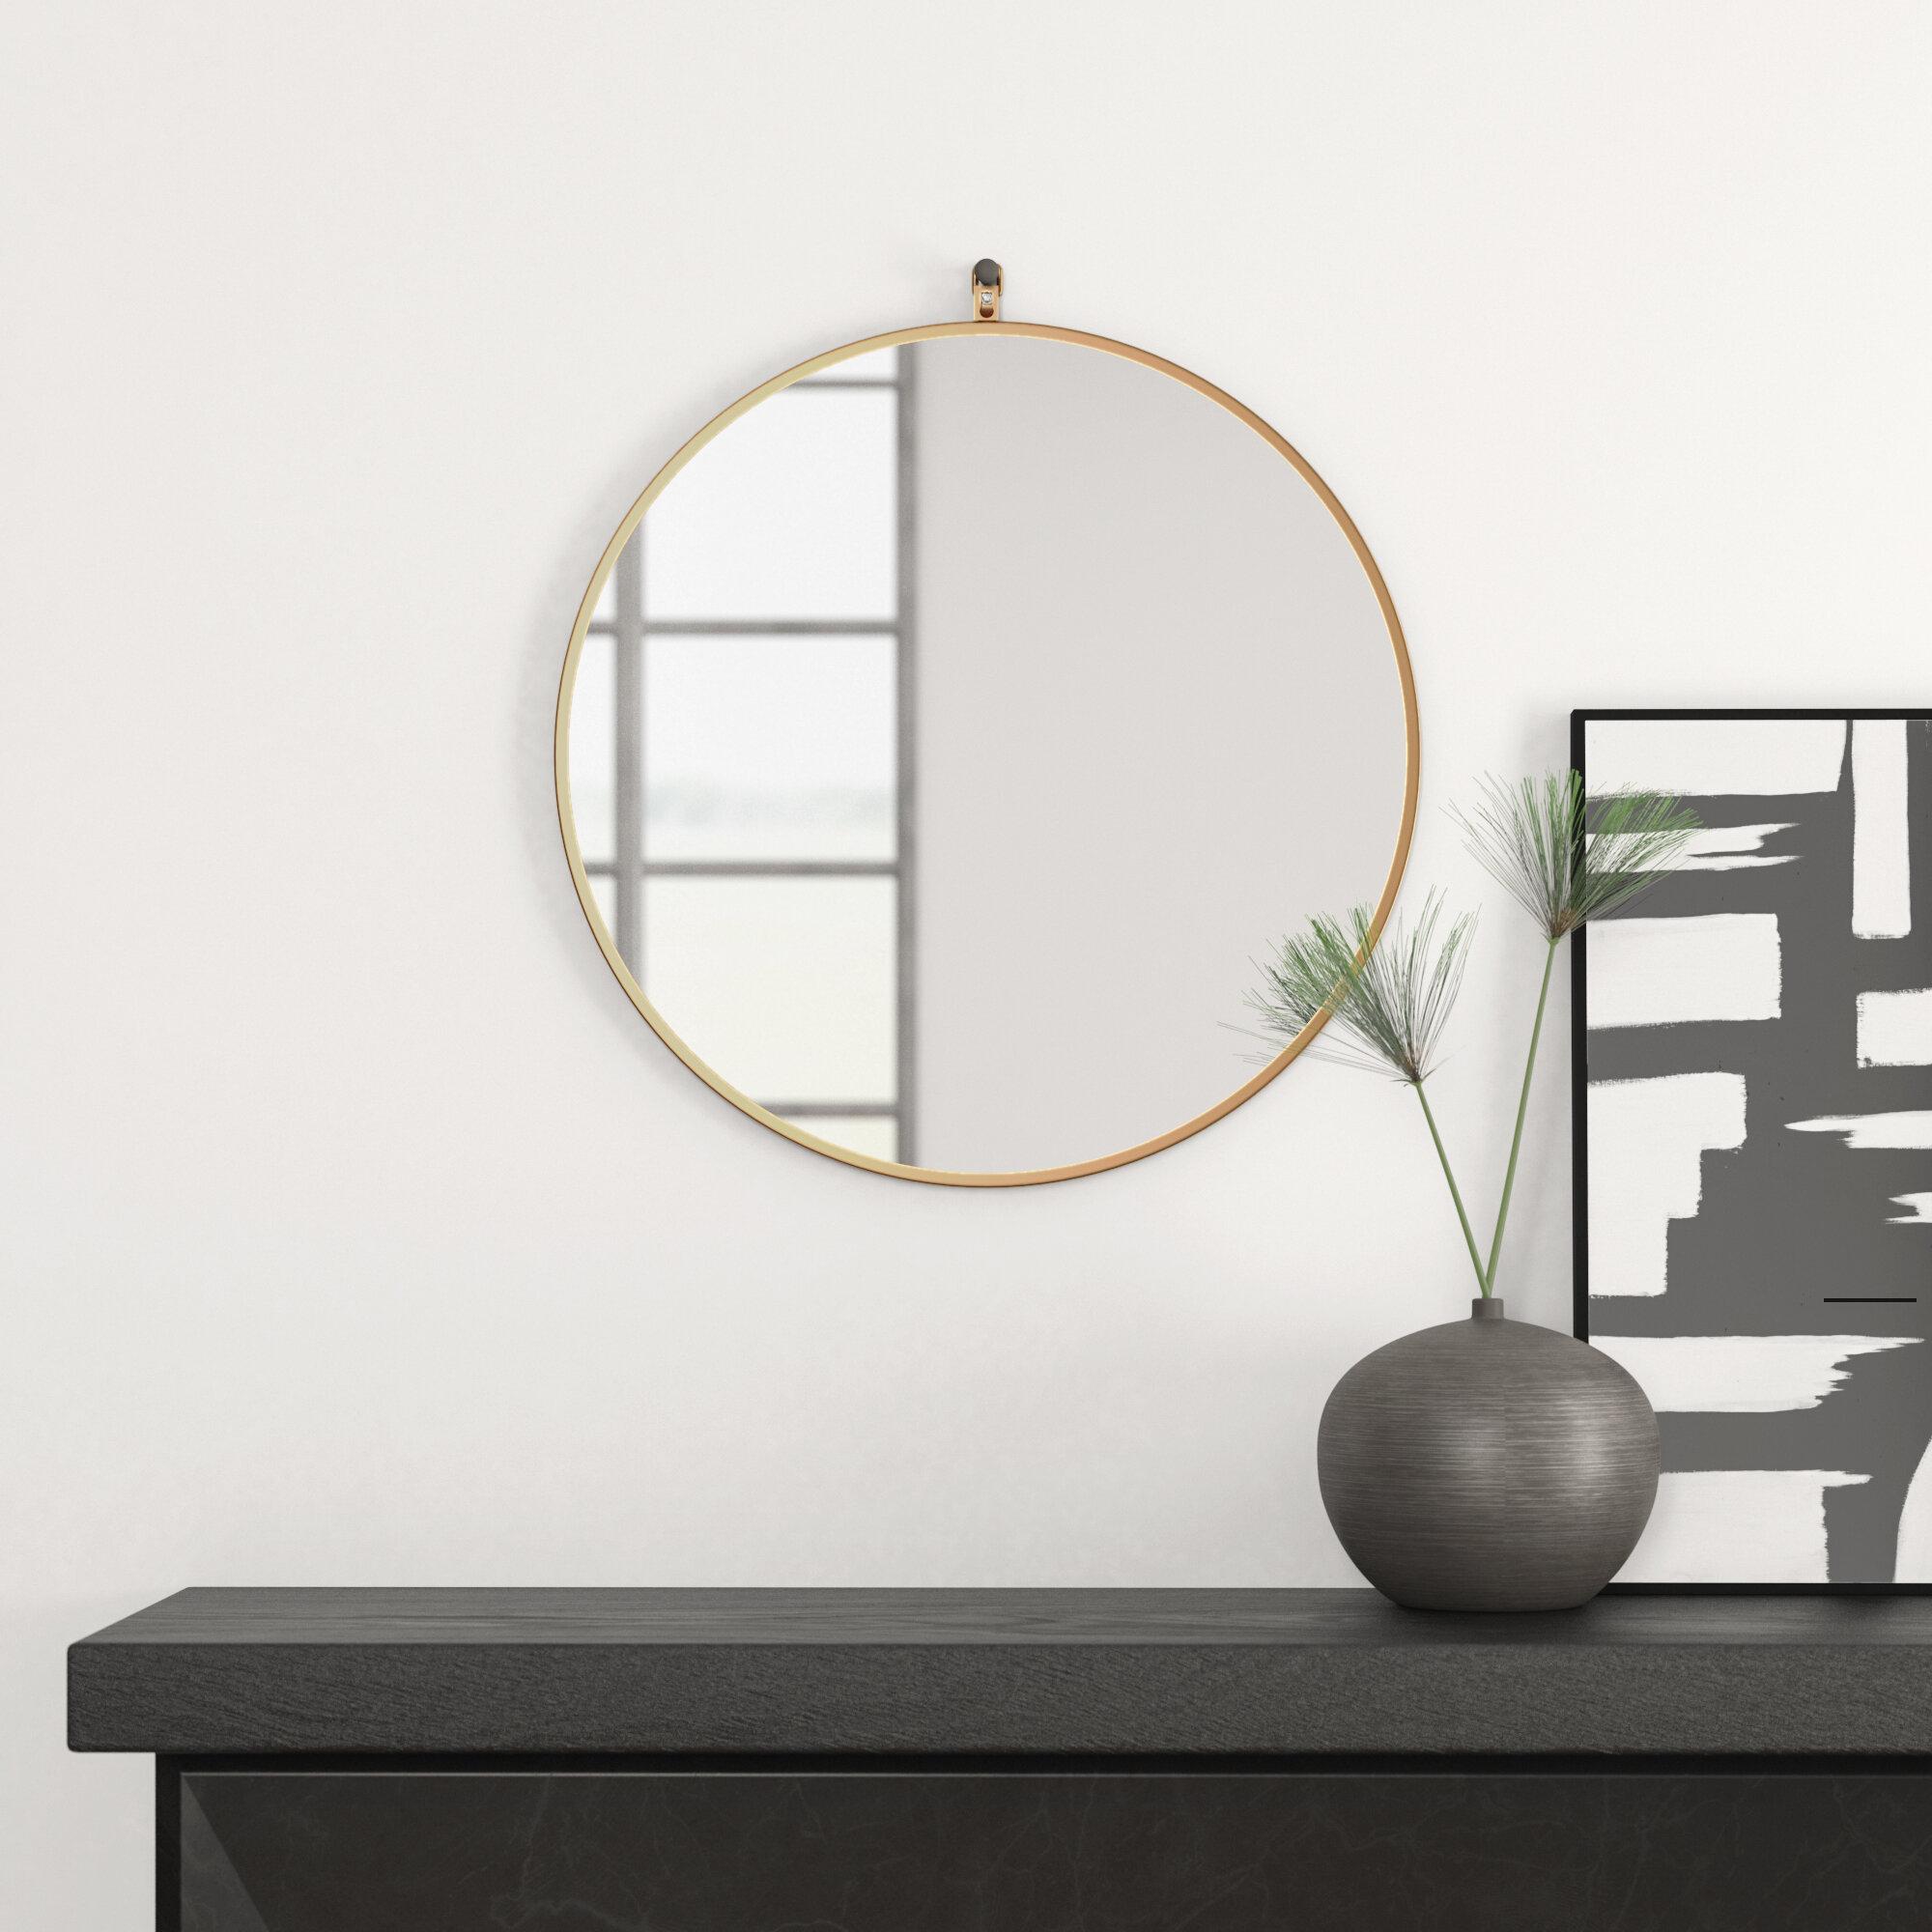 Yedinak Modern Distressed Accent Mirror Regarding Gaunts Earthcott Modern & Contemporary Beveled Accent Mirrors (Image 20 of 20)